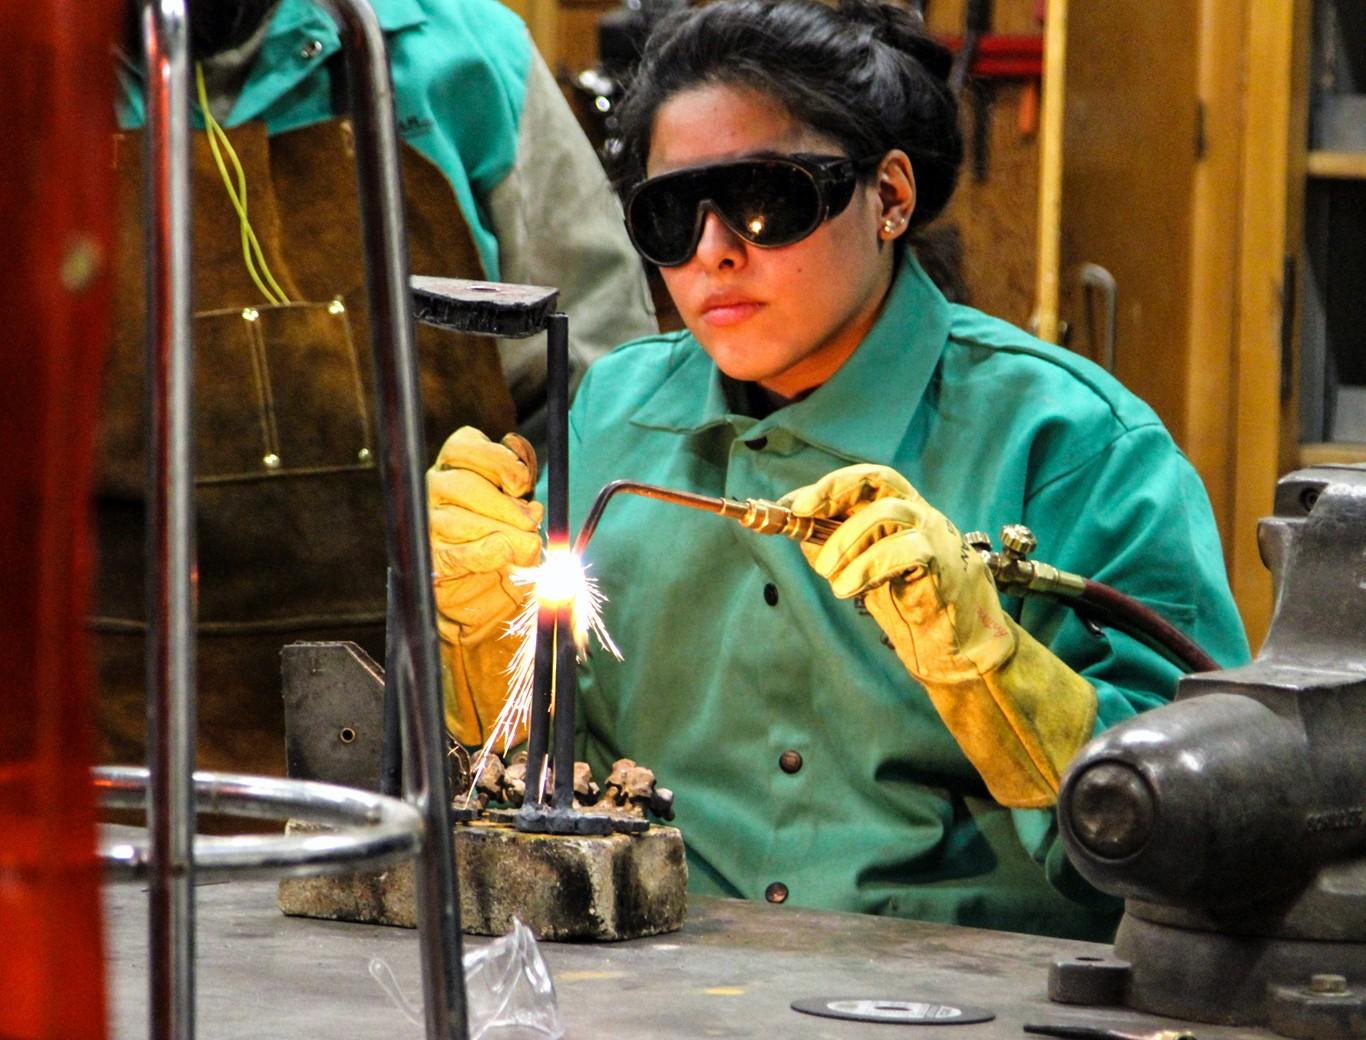 SoVA student using an arc welder fusing metals together.